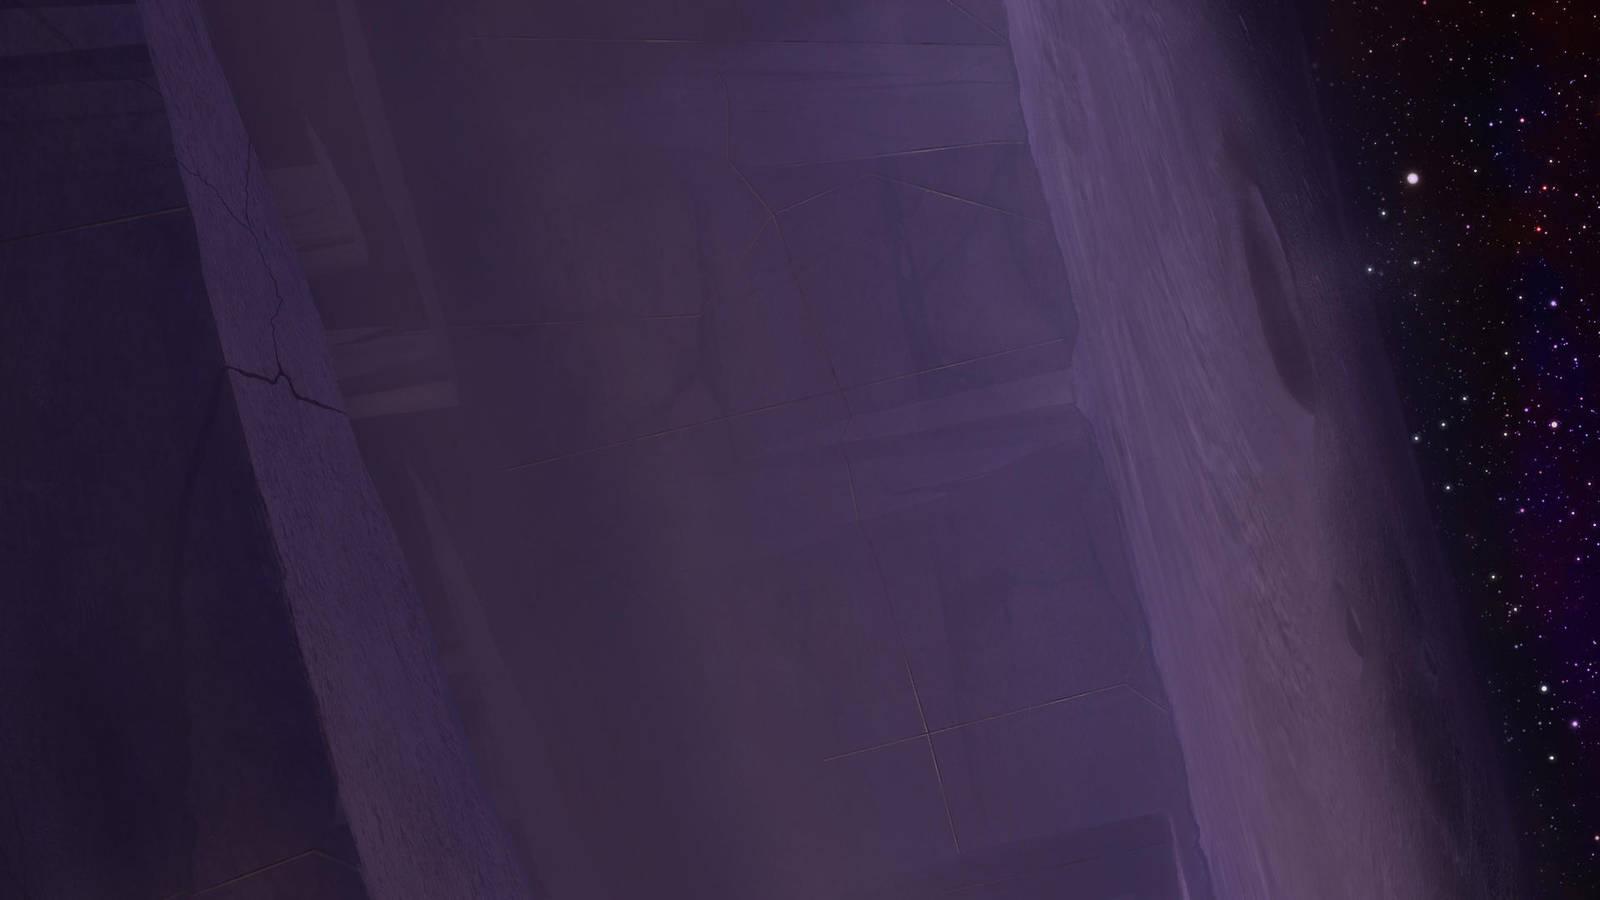 Stellar Perspective by NJPoulin